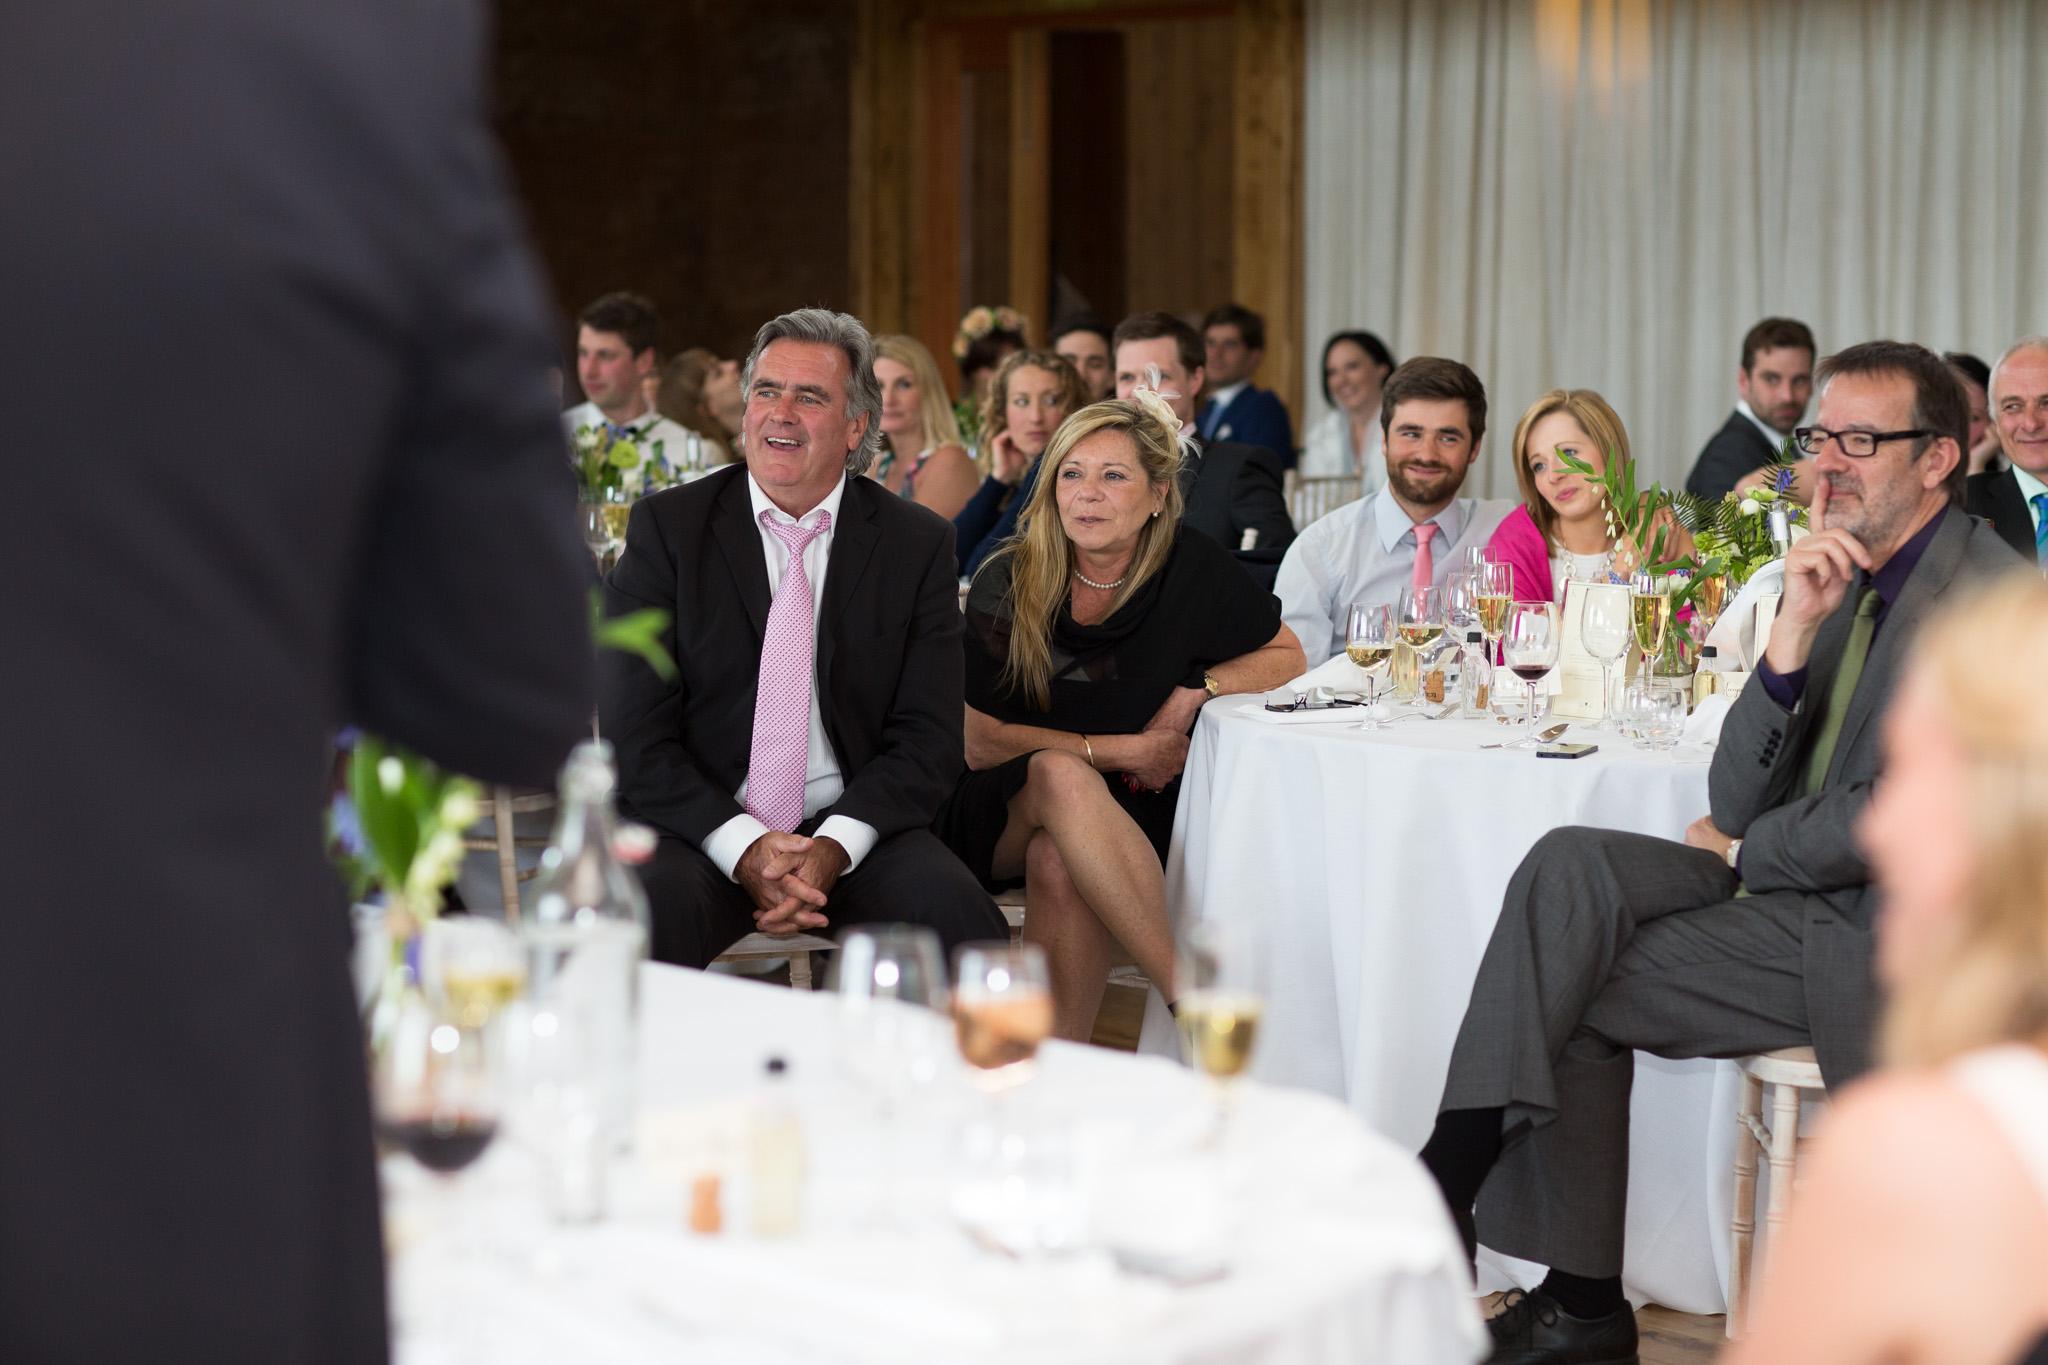 Mark_Barnes_Gloucester_Wedding_Photographer_Elmore_Court_Wedding_Photography_Mike+Kelly-85.jpg